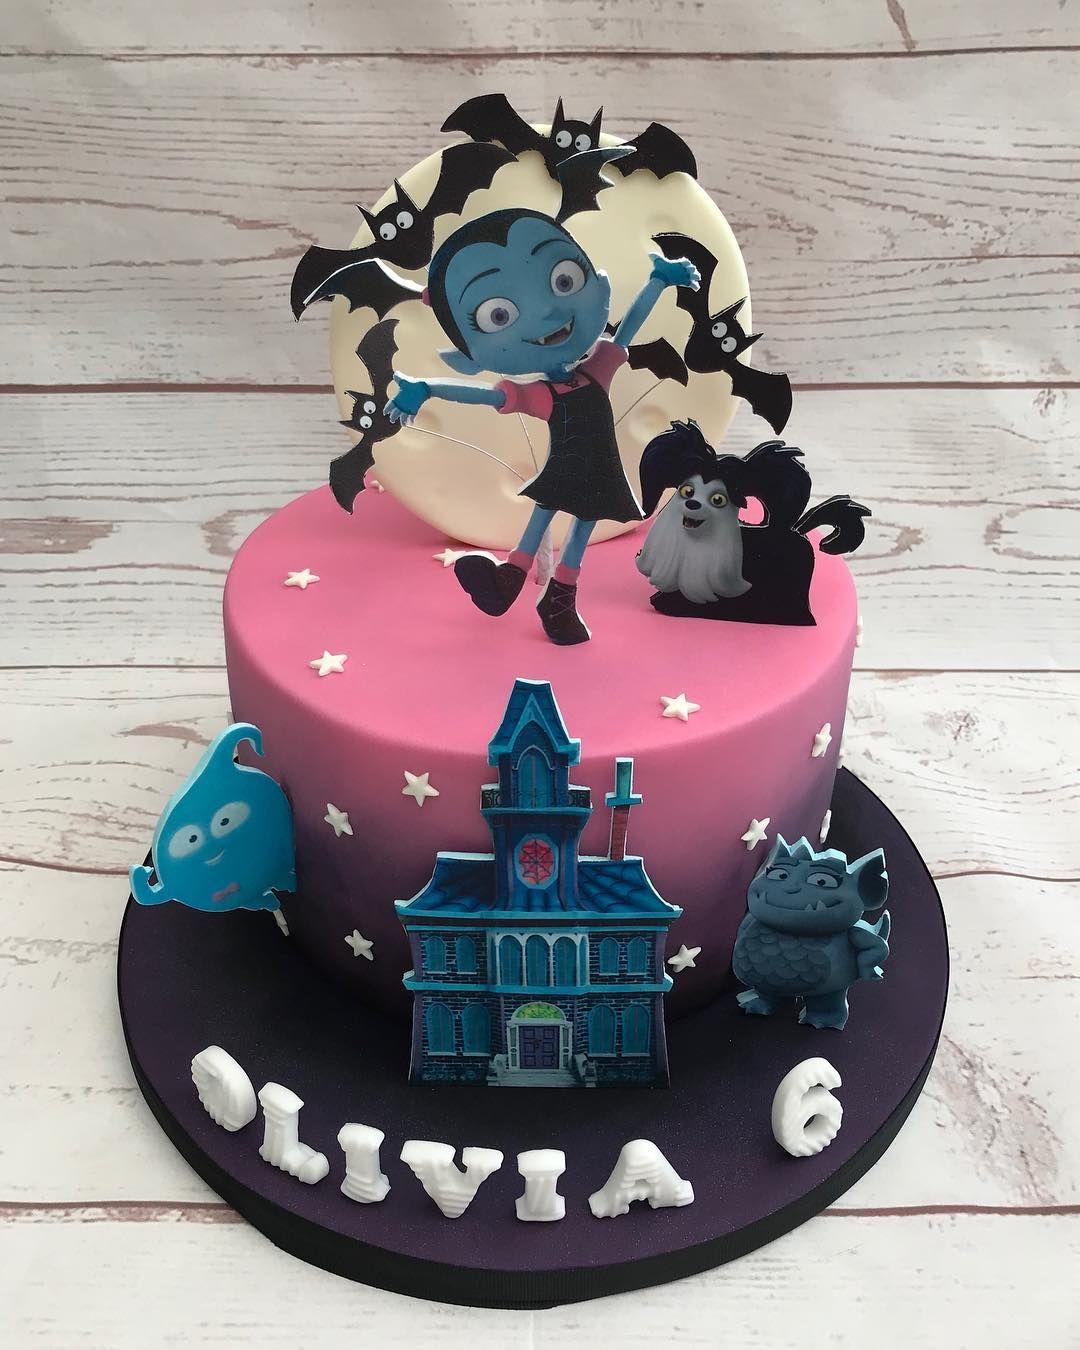 Fine Vampirina Birthday Cake Birthday Party Cake 3Rd Birthday Funny Birthday Cards Online Aboleapandamsfinfo